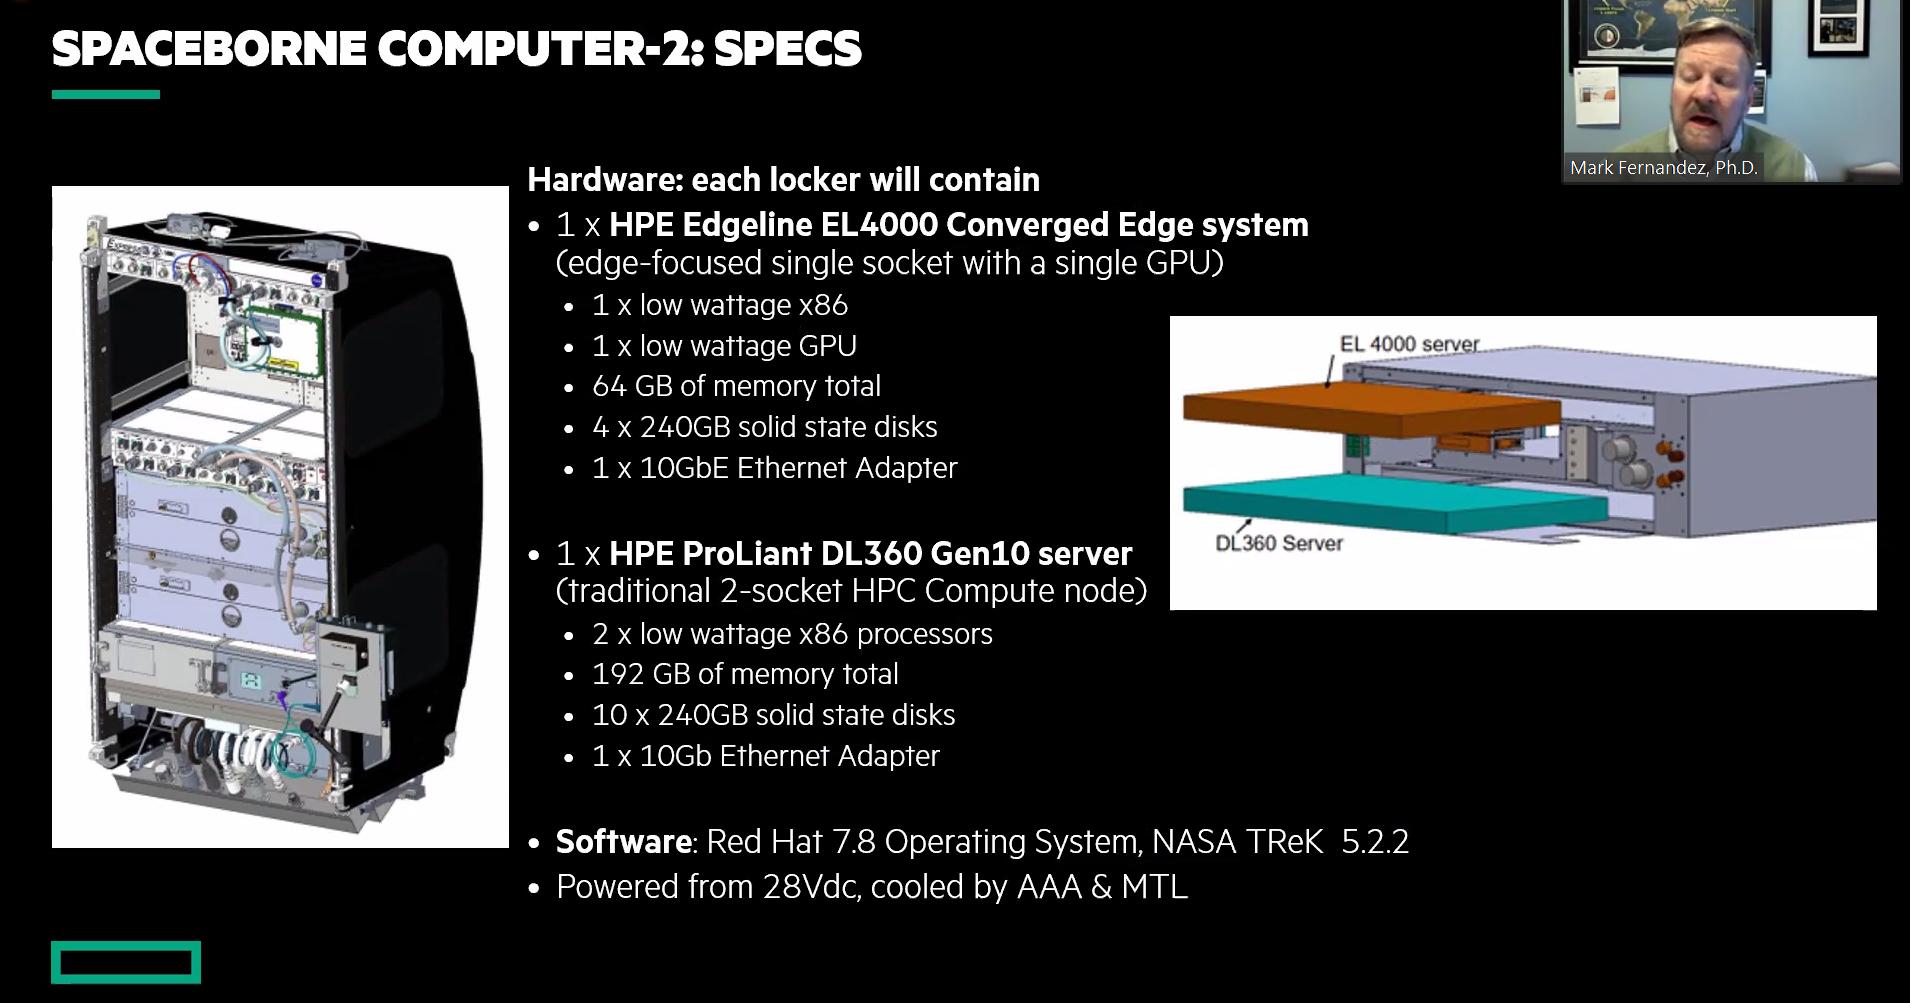 Hpe Spaceborne Computer-2 - Specifiche